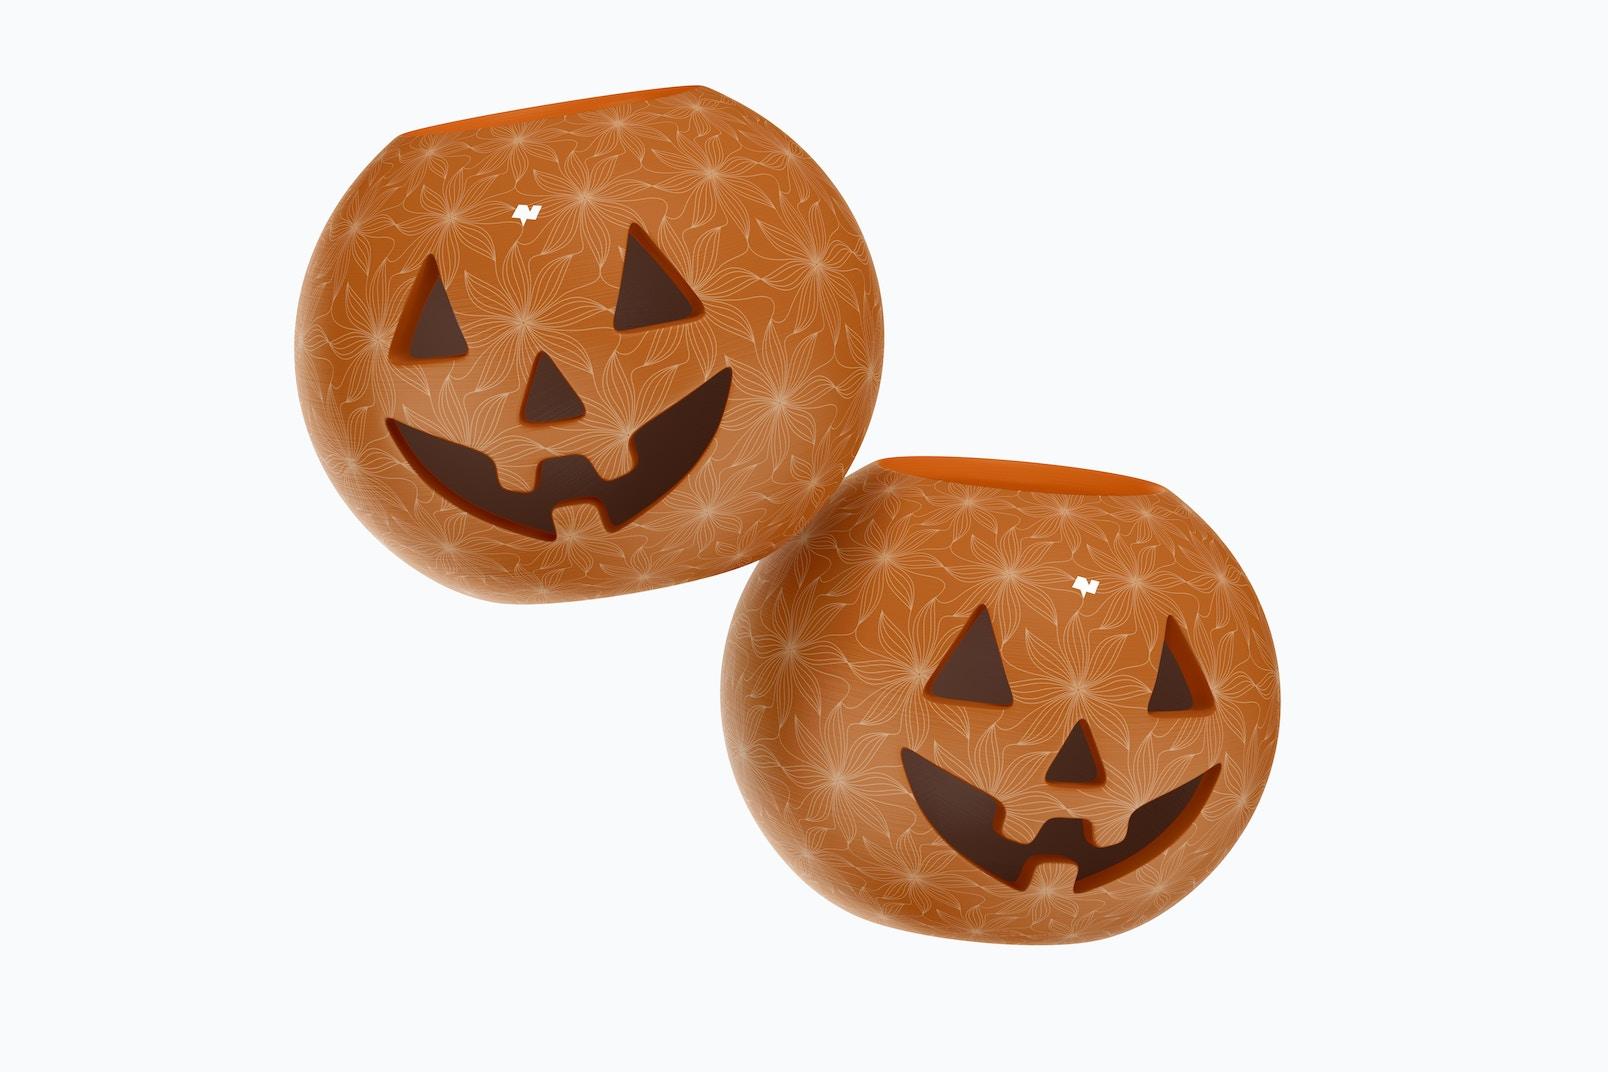 Ceramic Halloween Pumpkins Mockup, Floating